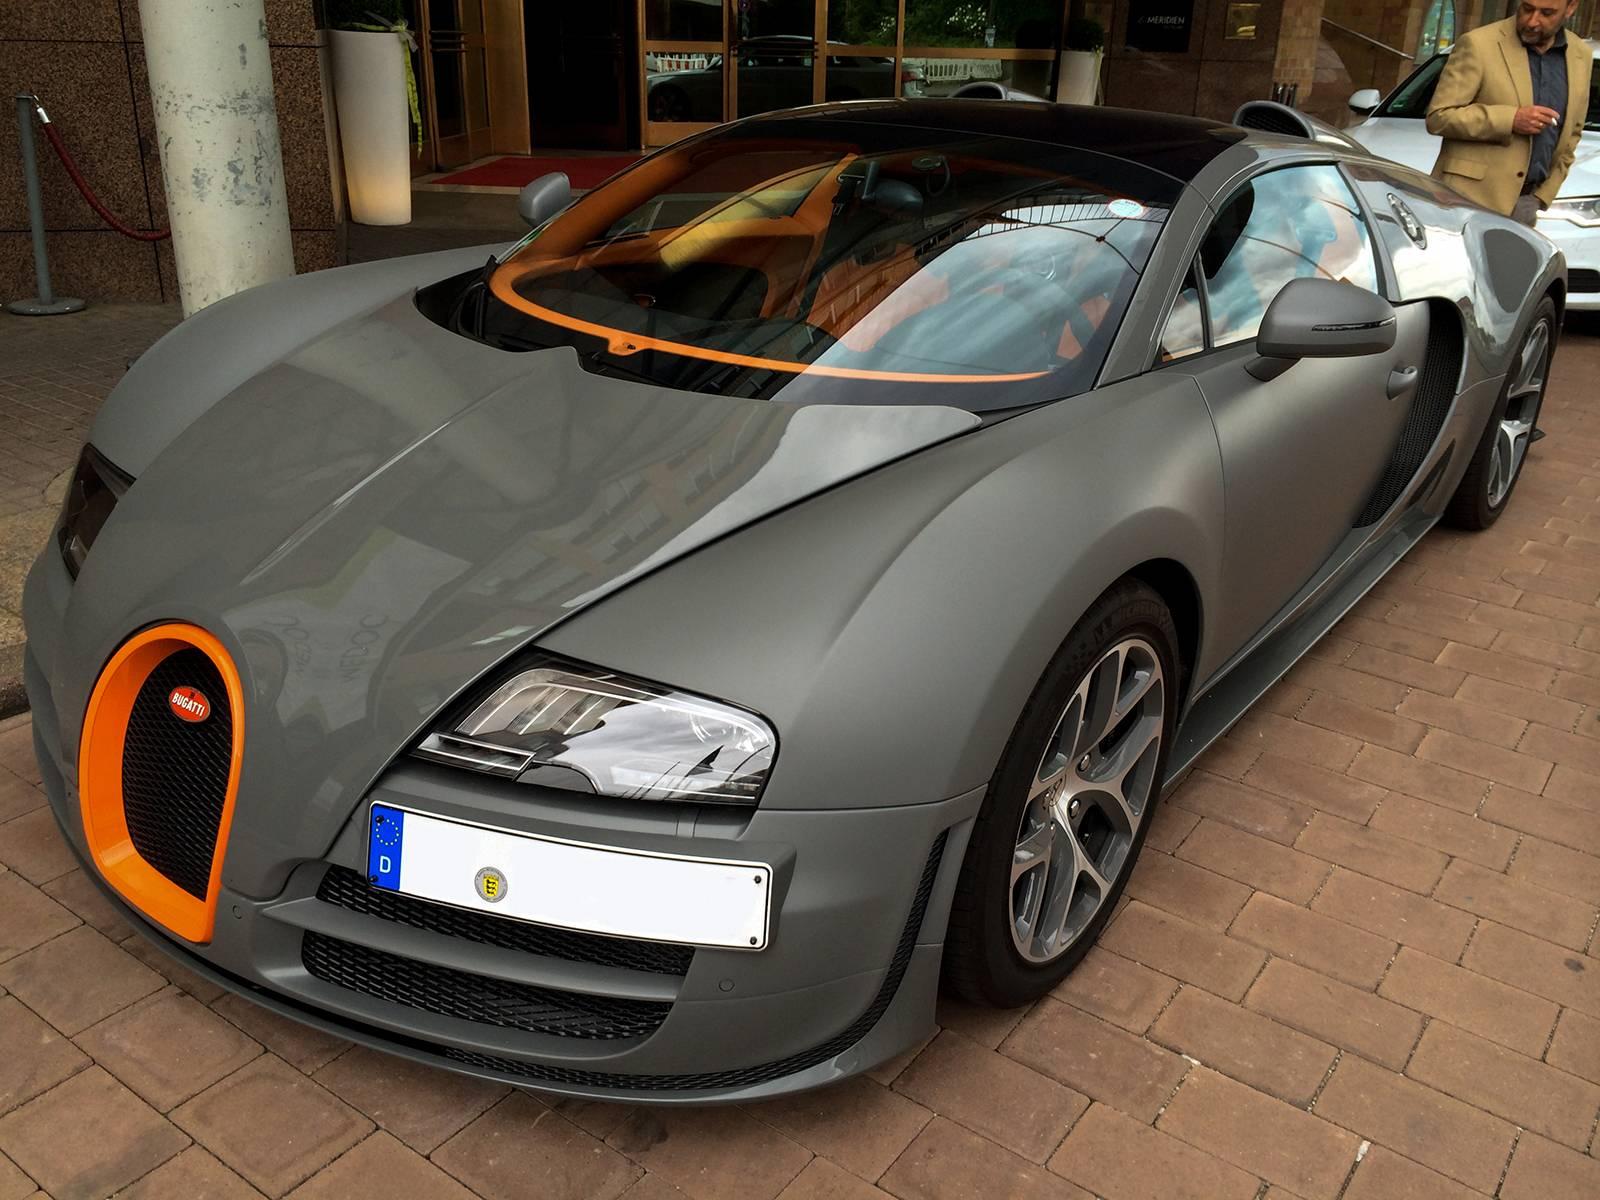 Bugatti-Veyron-Grand-Sport-Vitesse-1 Fascinating Bugatti Veyron Grand Sport Vitesse 1/4 Mile Cars Trend